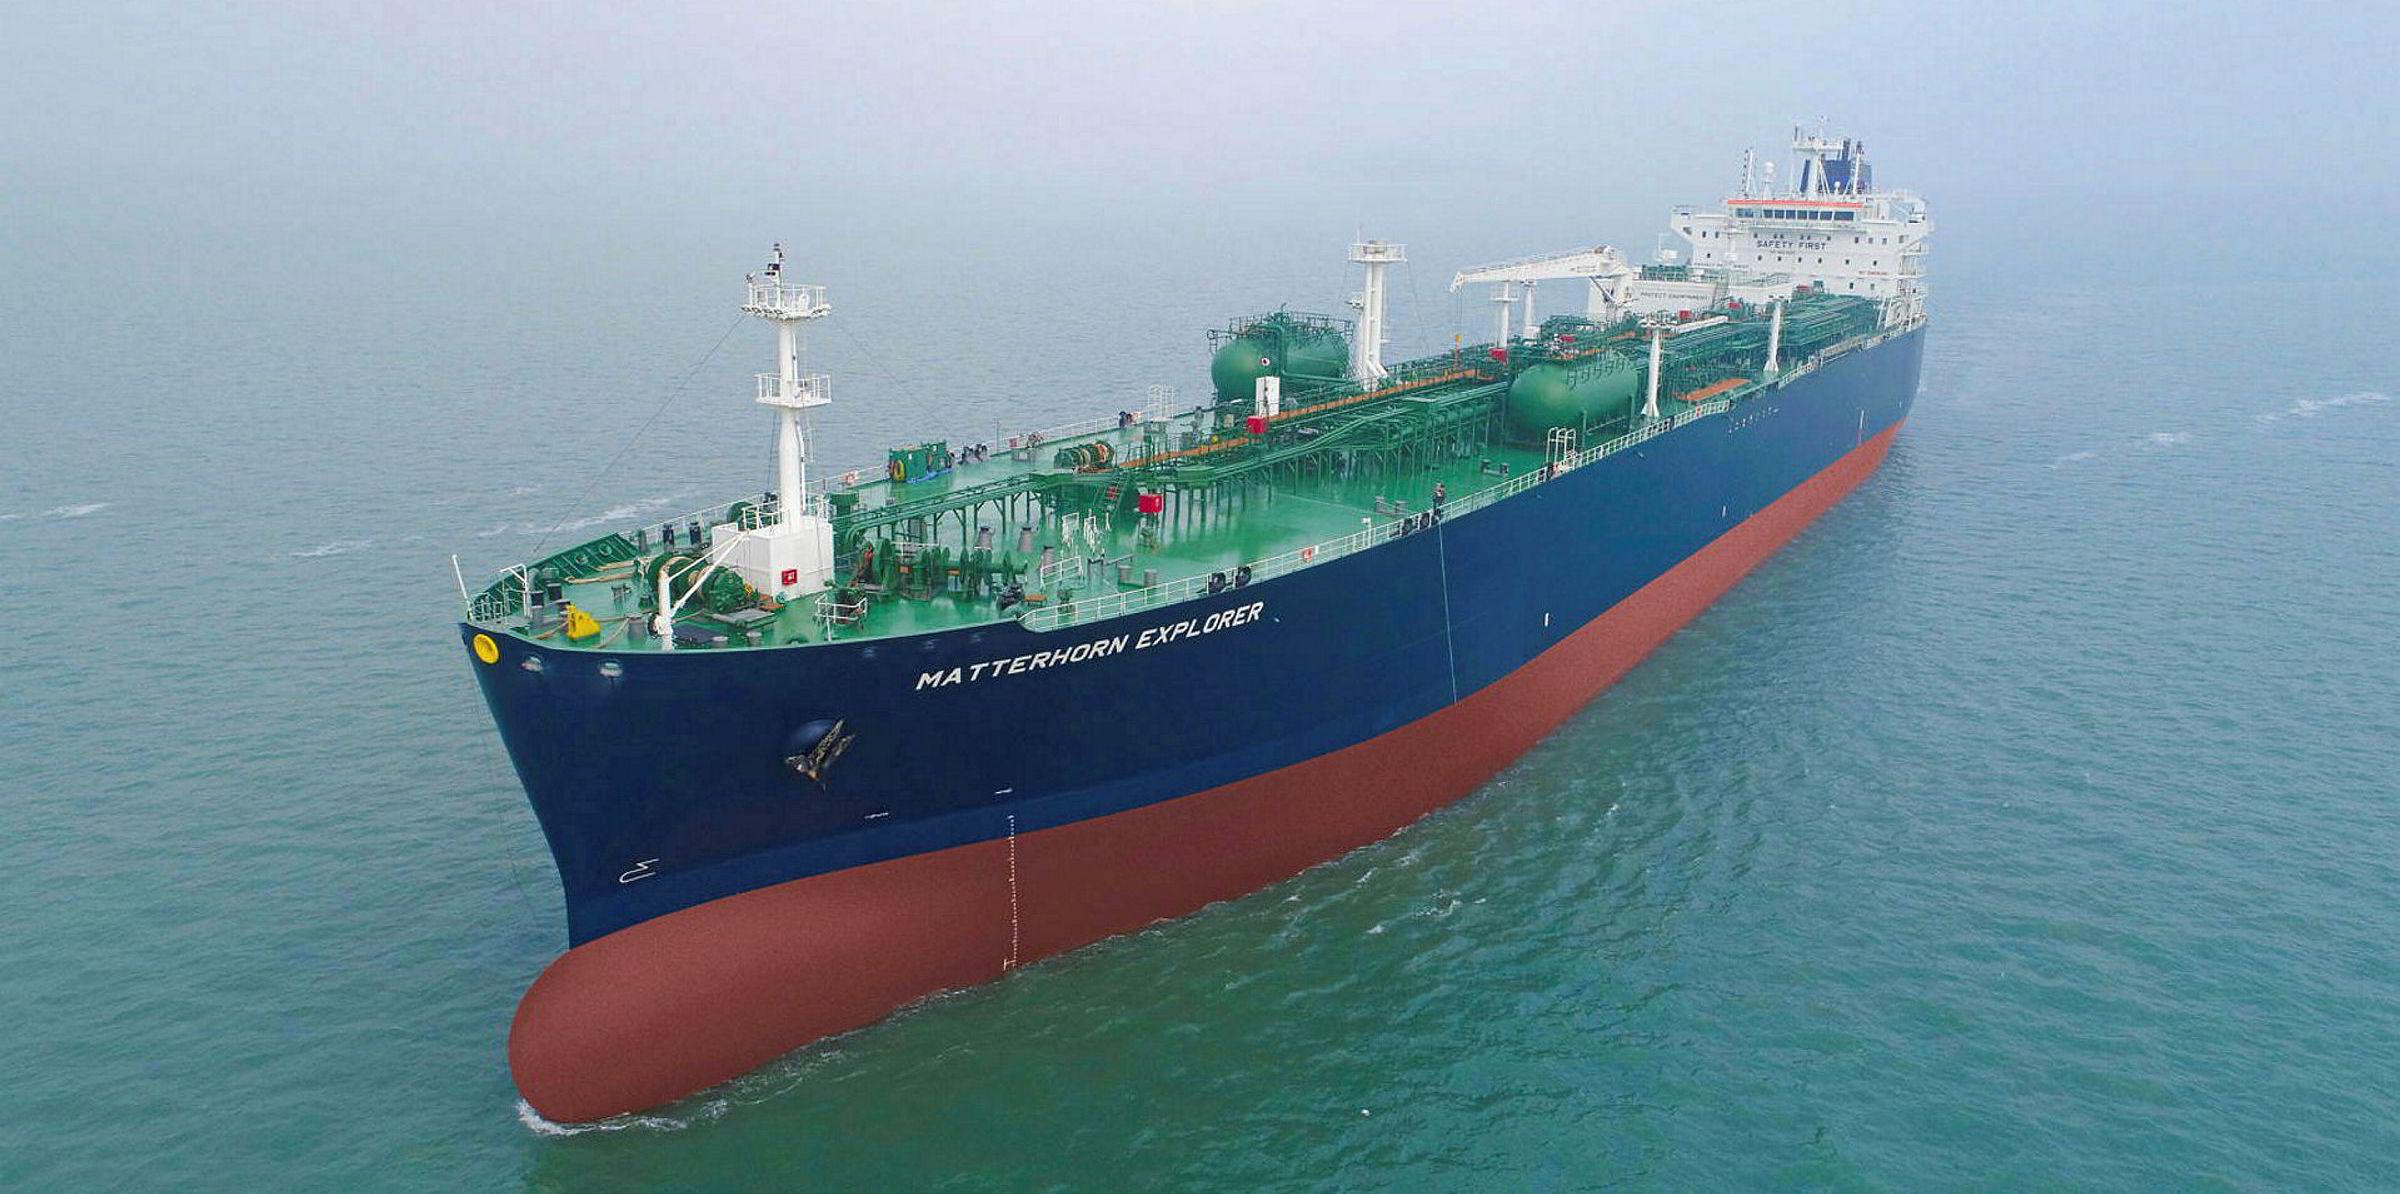 Trafigura in talks with Hyundai Heavy for LPG-fuelled VLGC